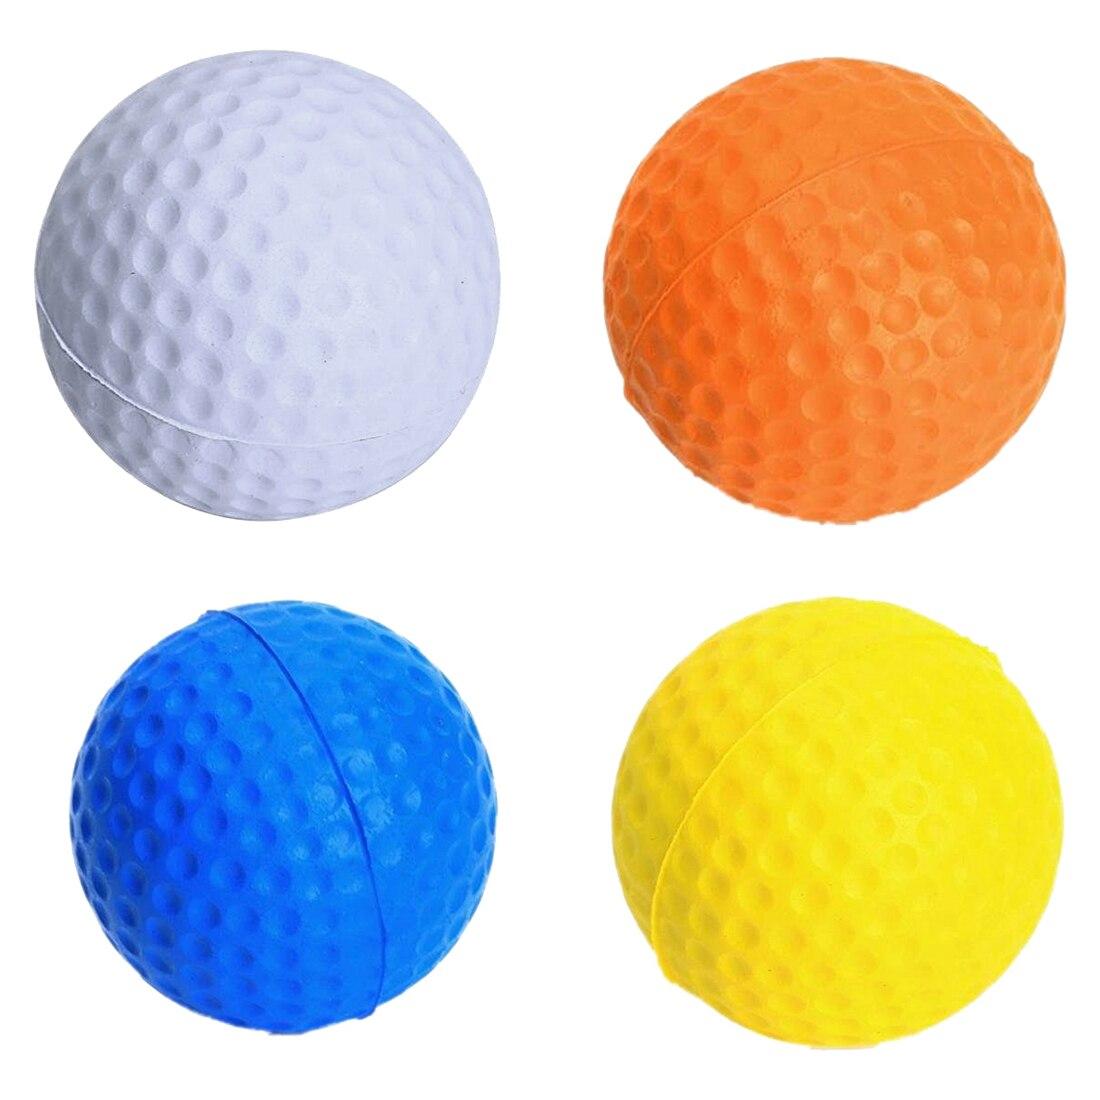 4 Pcs Golf Ball Golf Training Soft Softballs Practice Balls White, Blue, Orange, Yellow